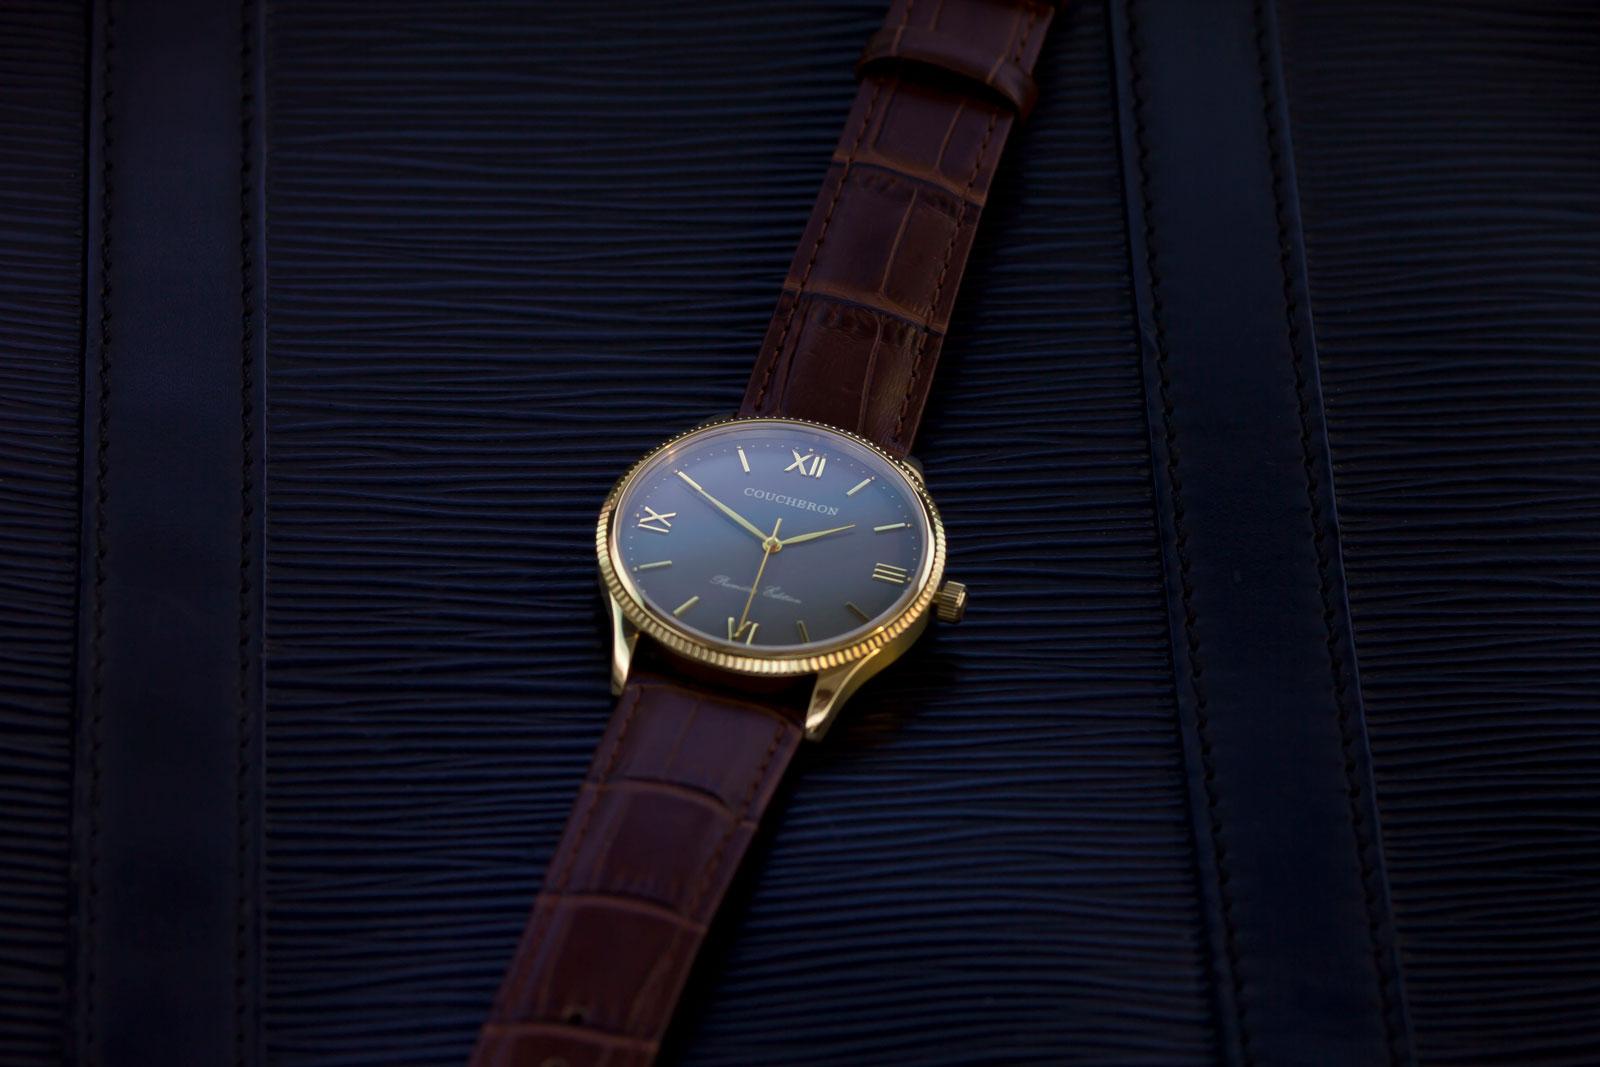 160905-cw-yellow-gold-on-black-leather_lq_web